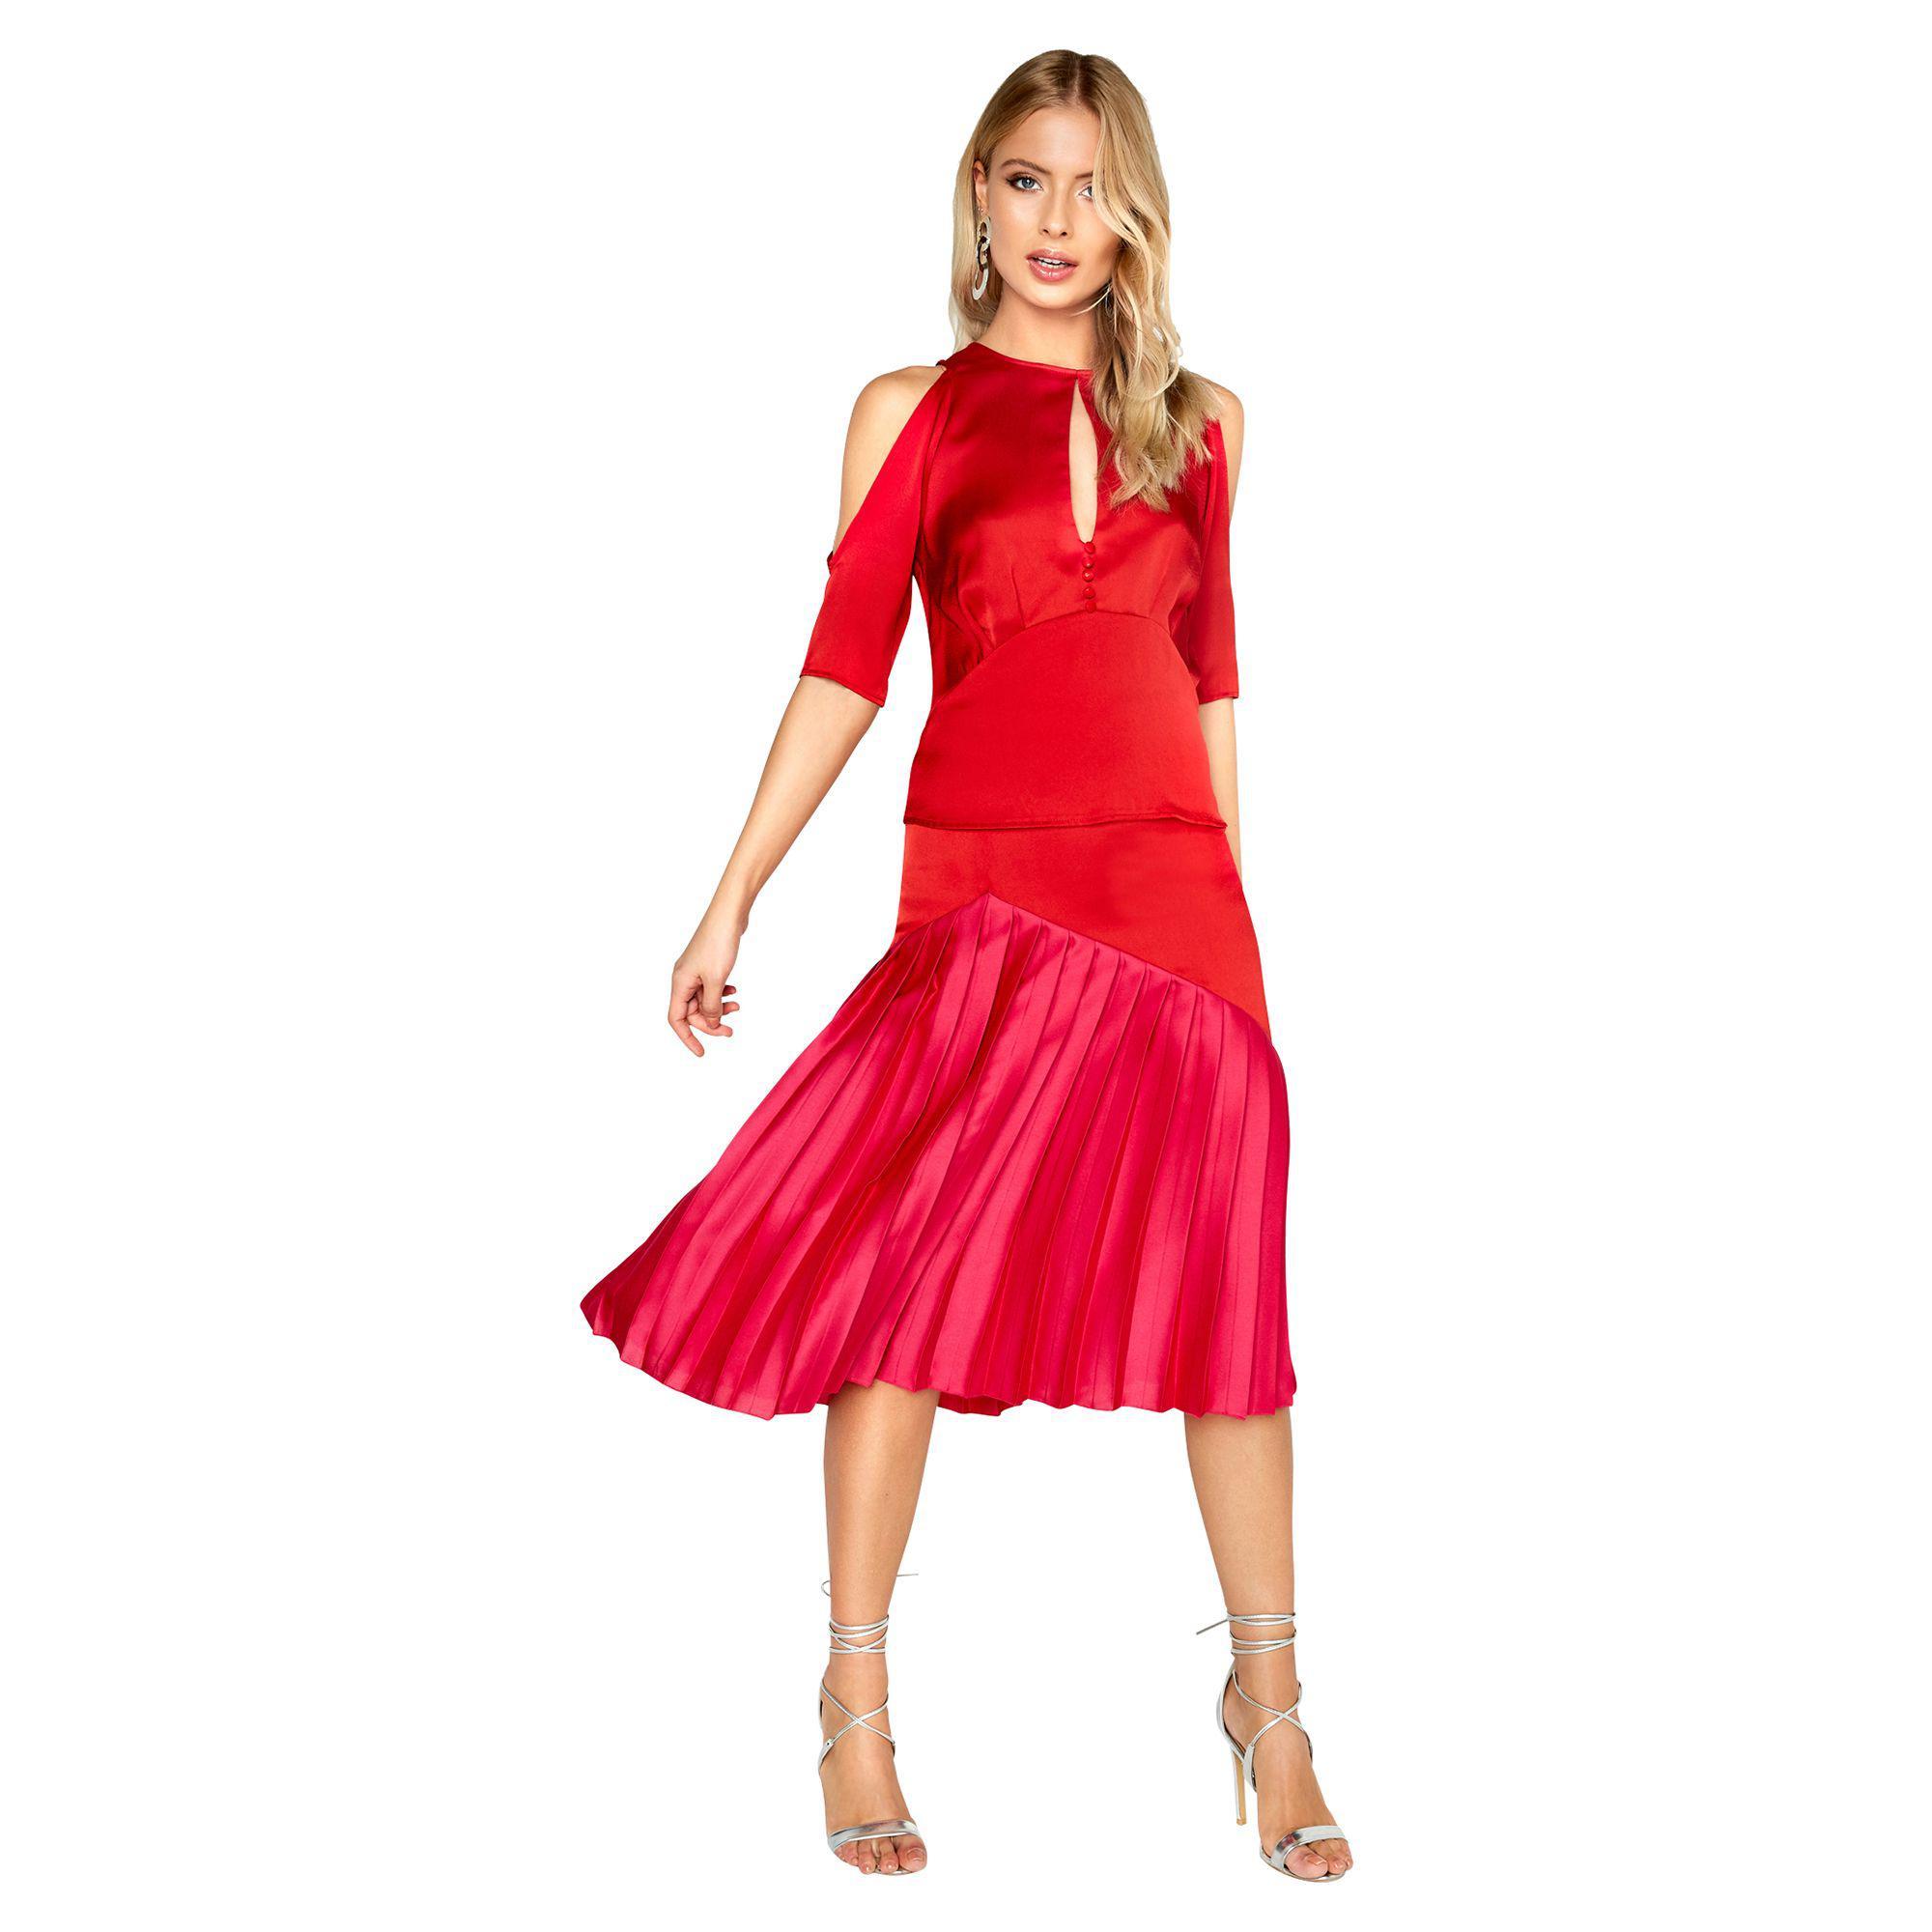 96275d074acd Debenhams Ladies Wear Skirts